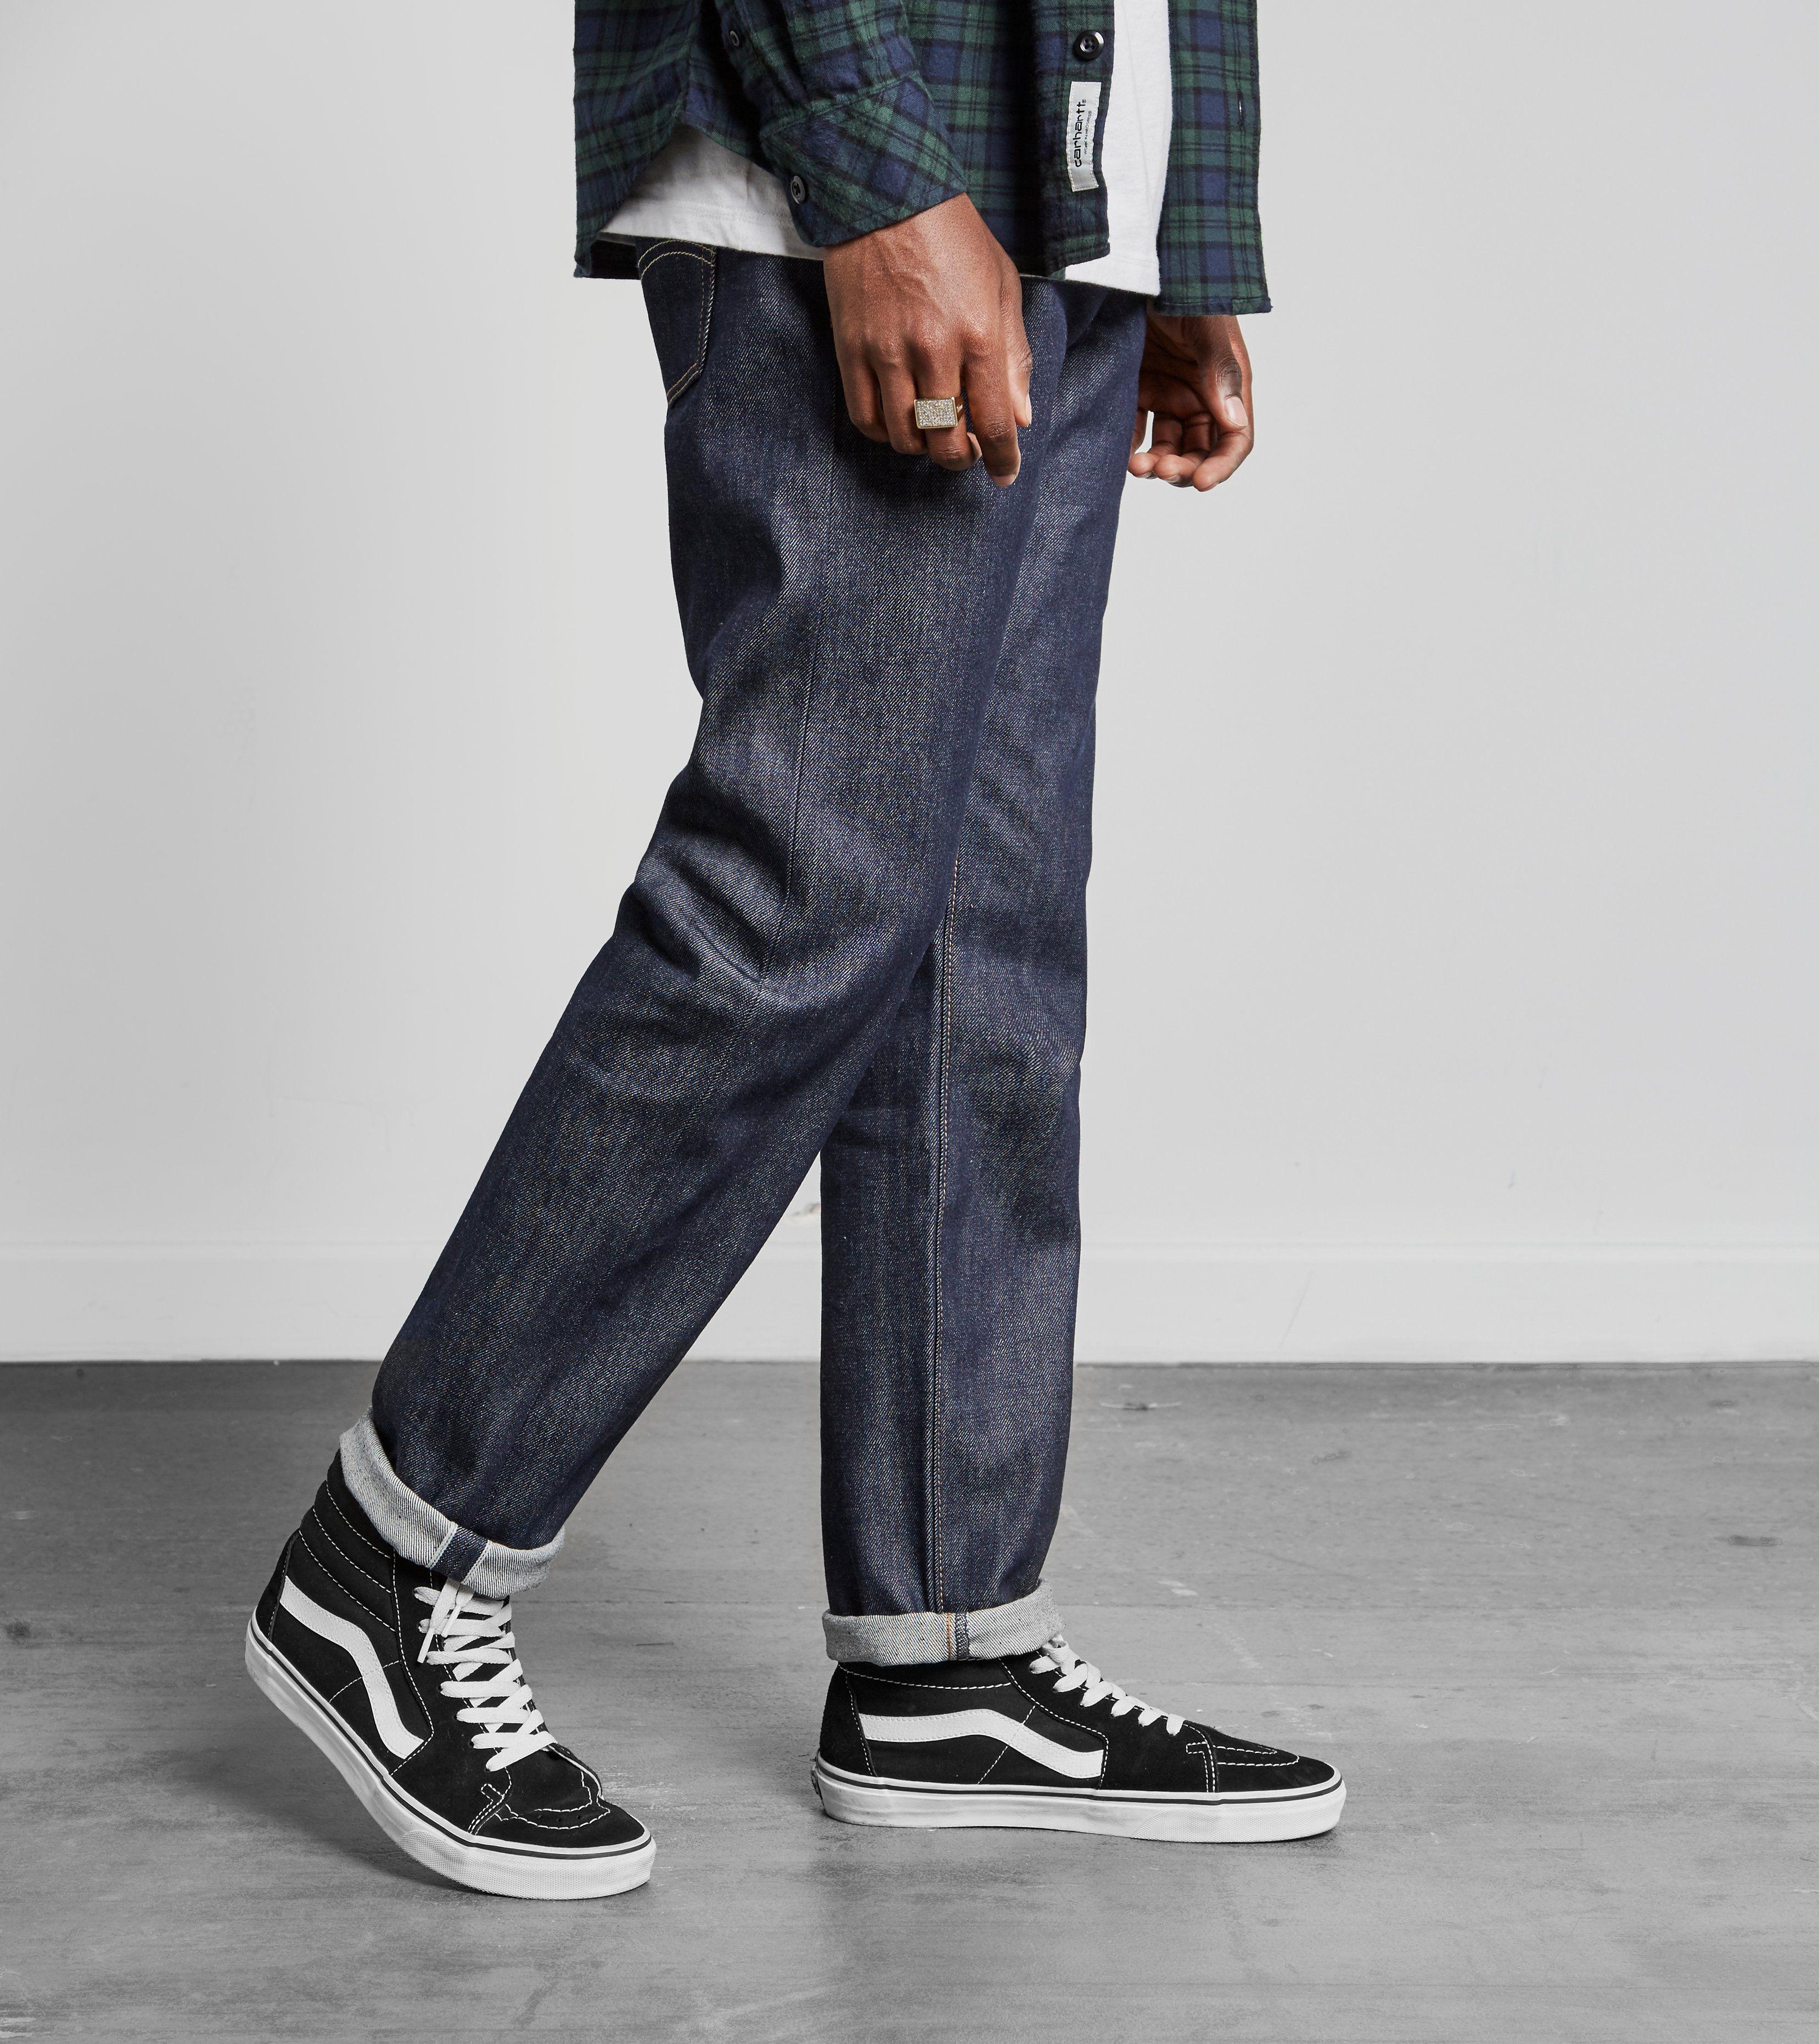 the latest 8b02c b3320 Levis 511 Rigid Selvedge Slim Fit Jeans